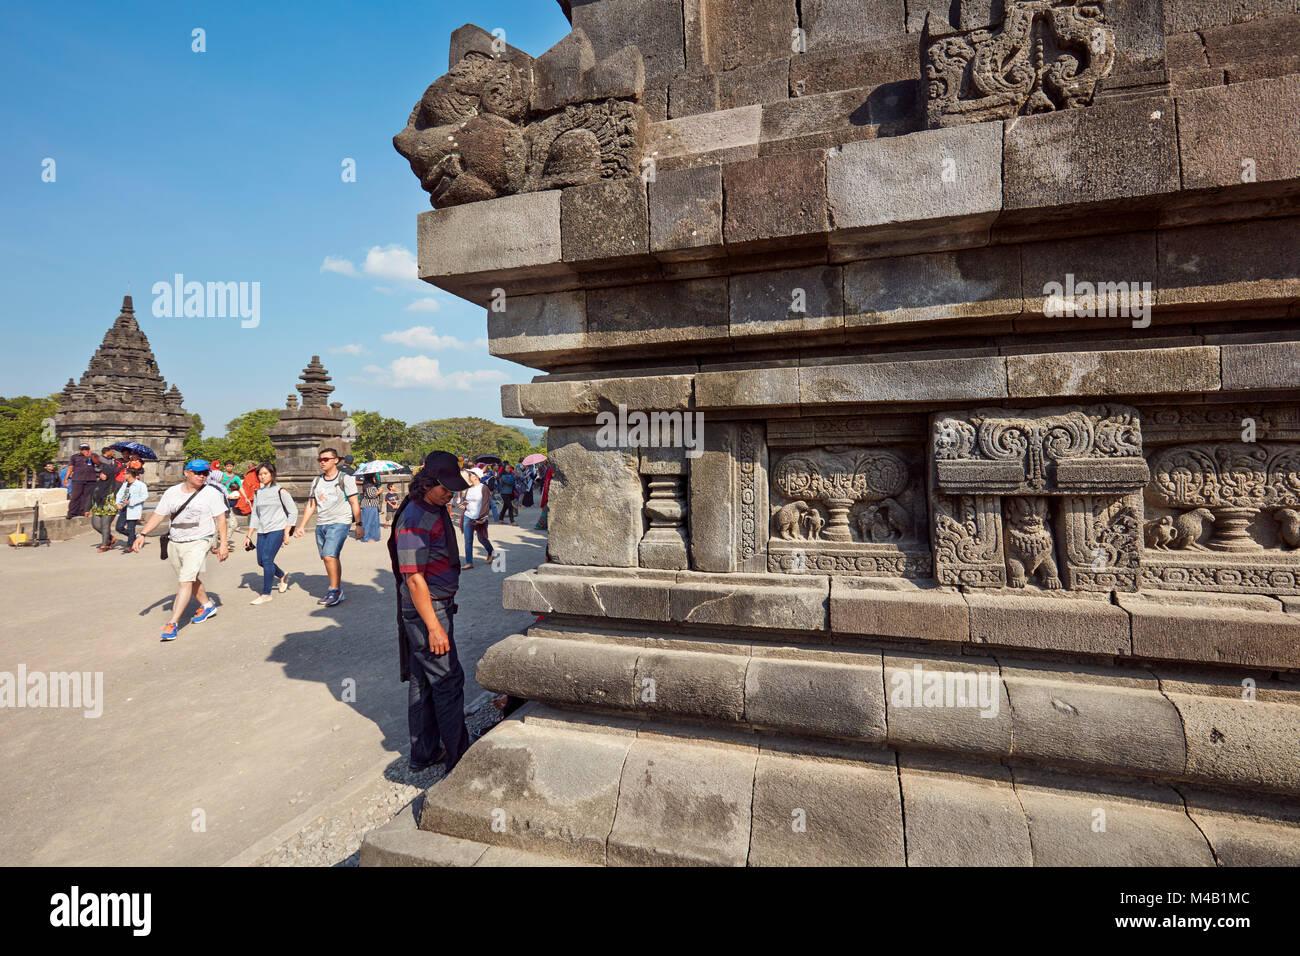 Stone carvings on a tower base. Prambanan Hindu Temple Compound, Special Region of Yogyakarta, Java, Indonesia. - Stock Image